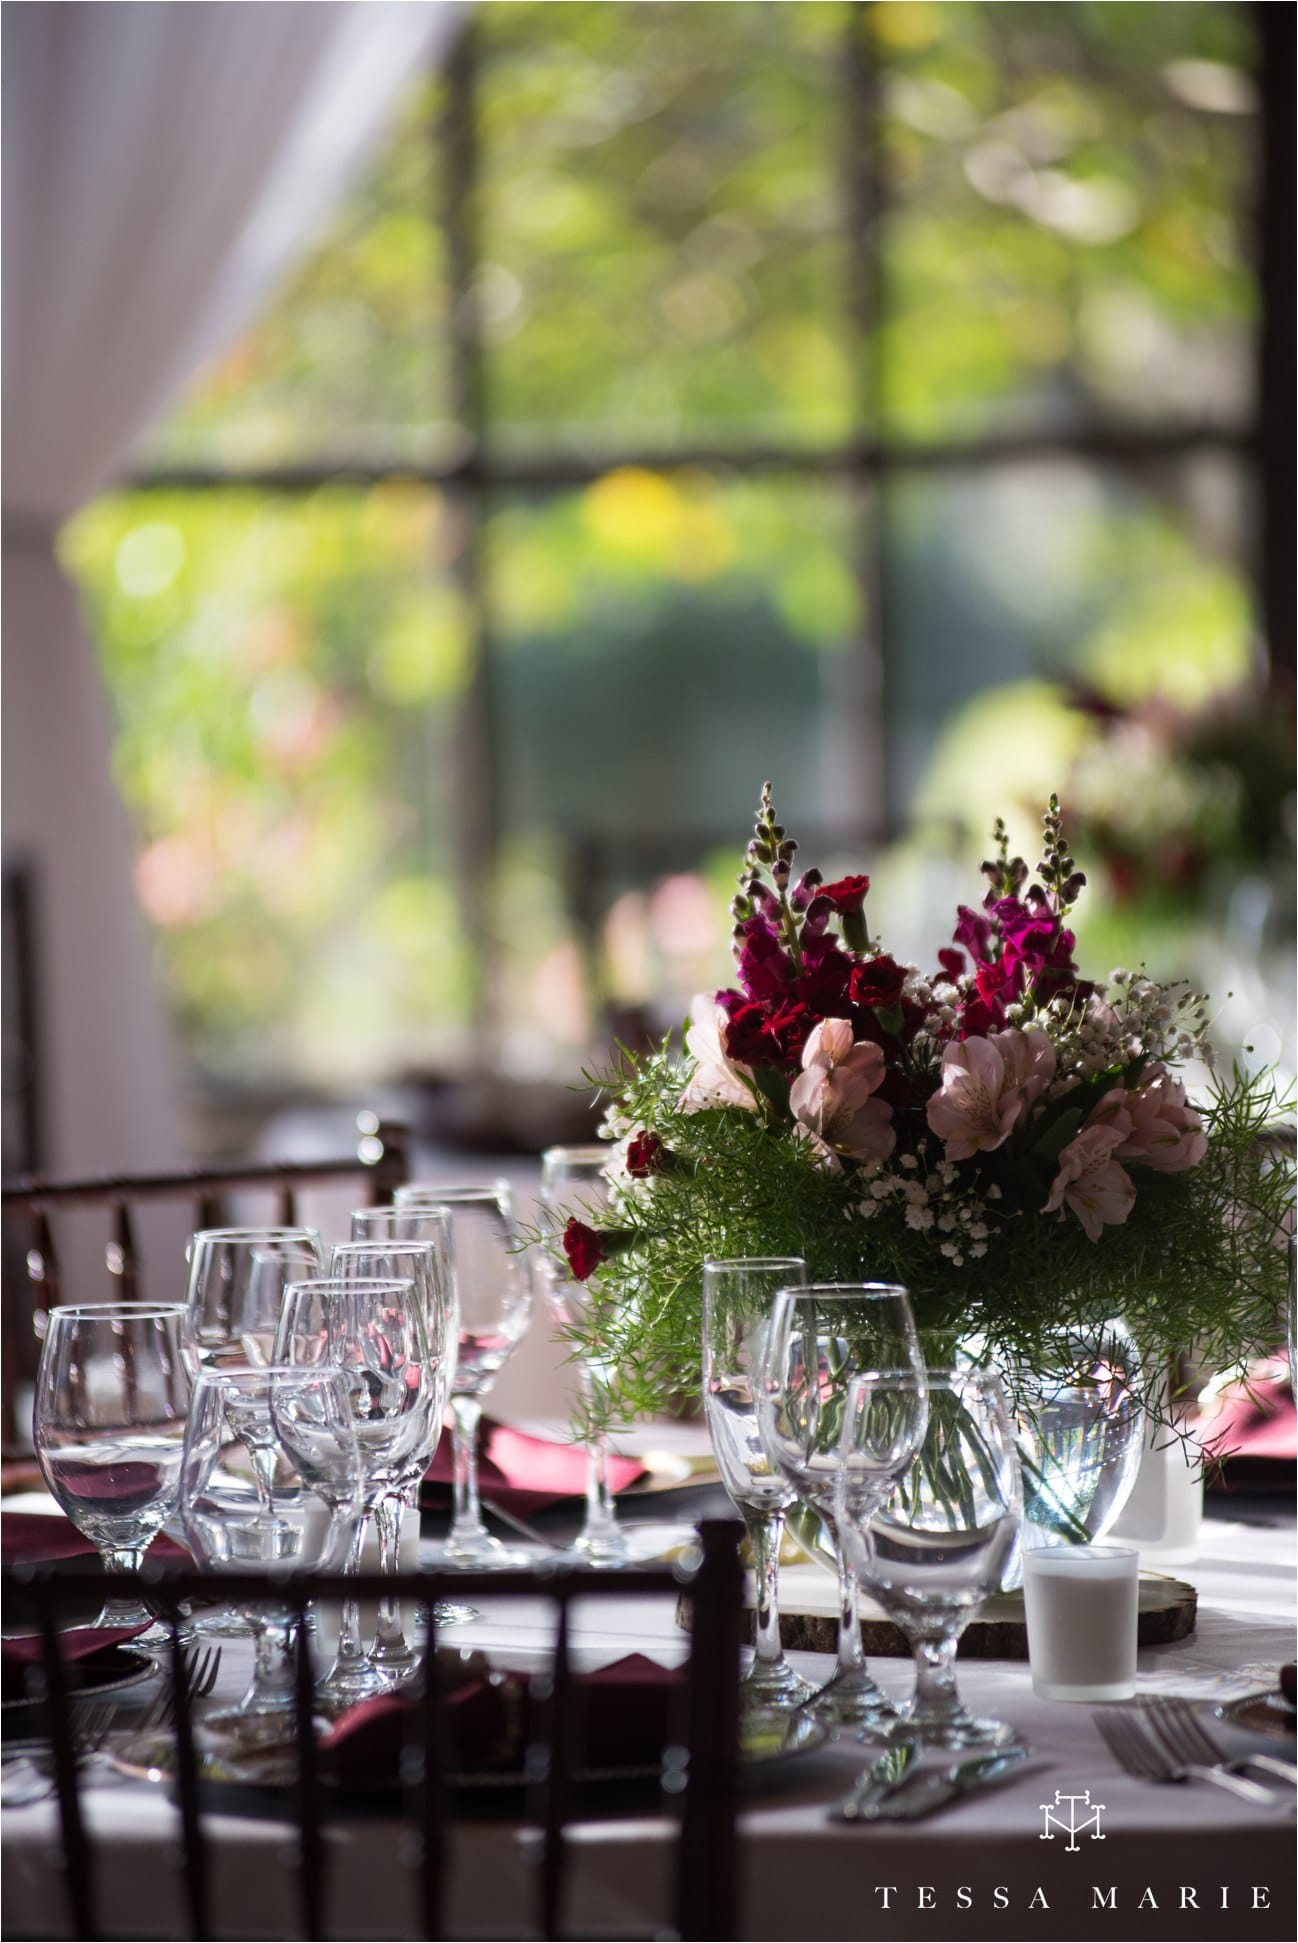 tessa_marie_weddings_rivermill_event_centere_candid_outdoor_wedding_photos_0161